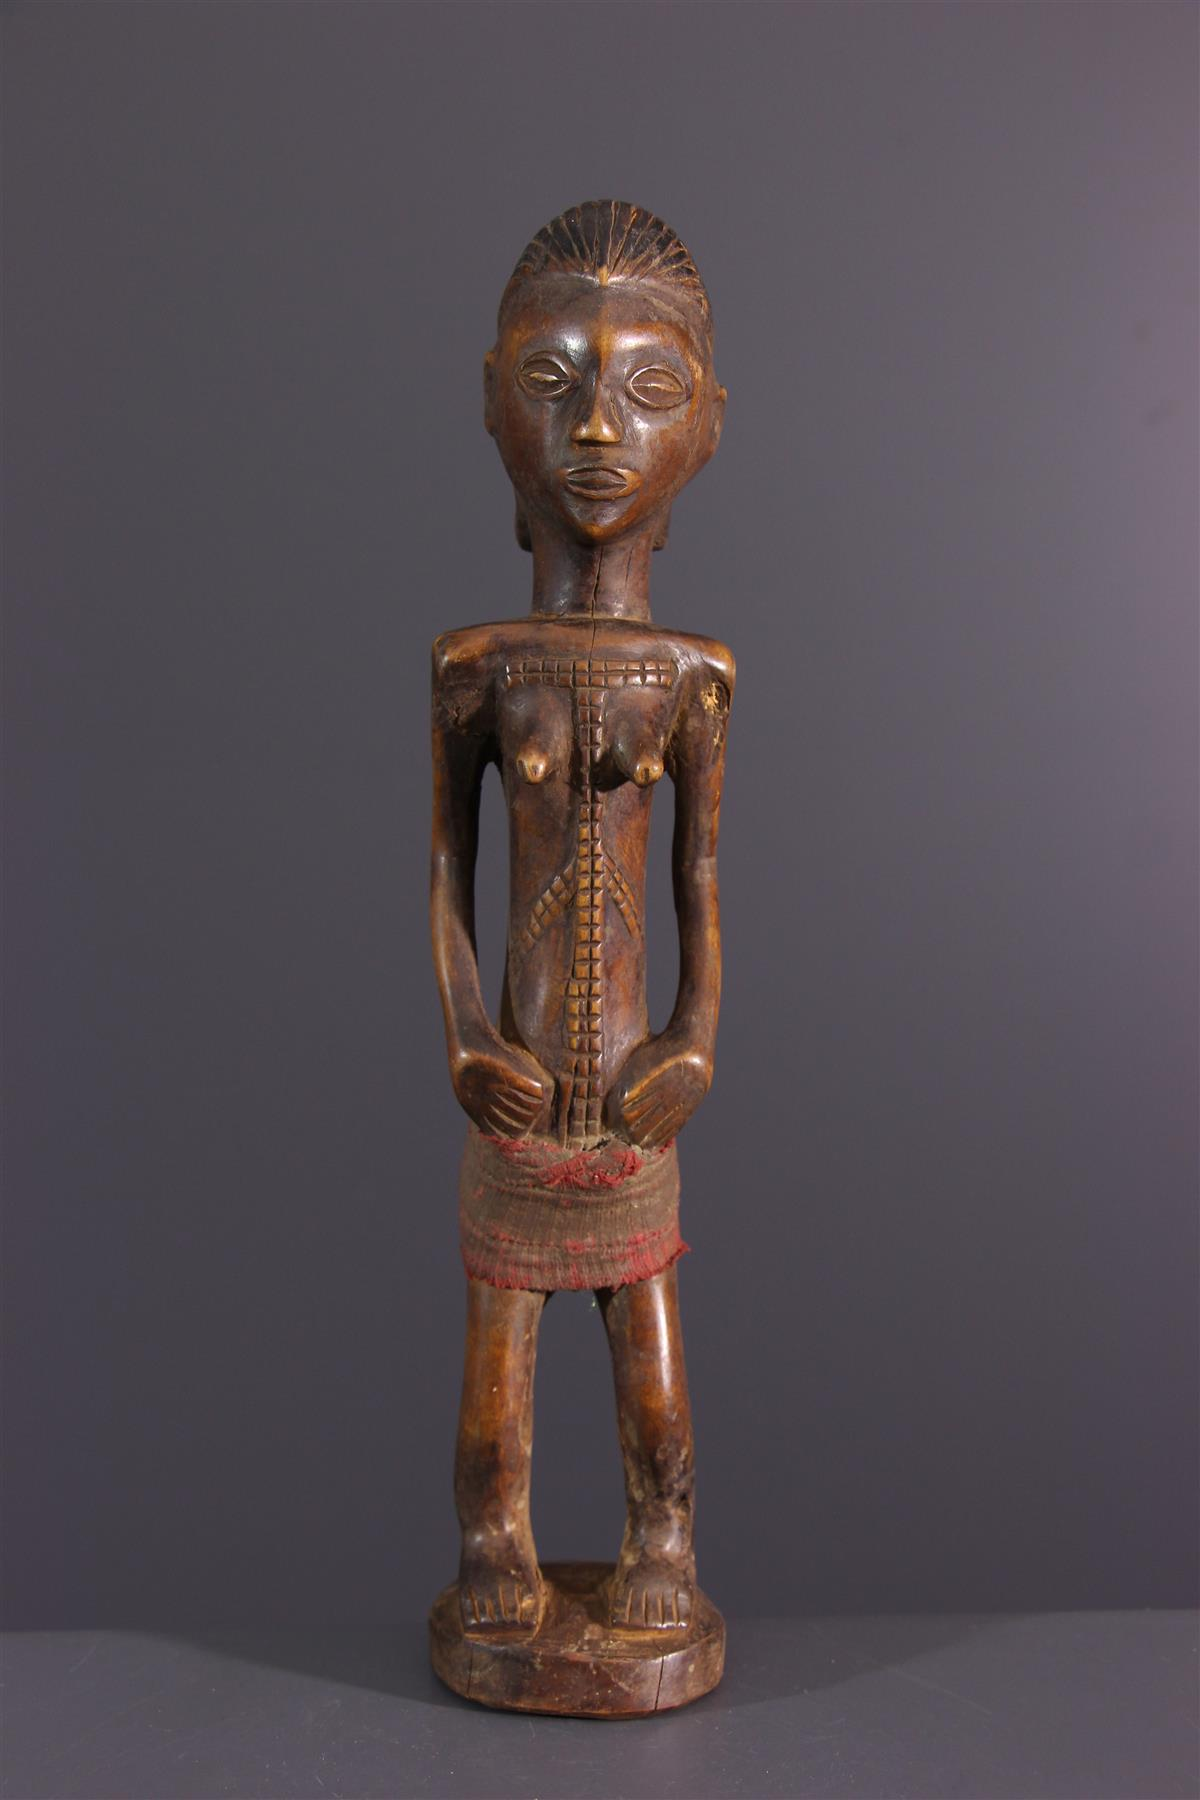 Tabwa statue - African art